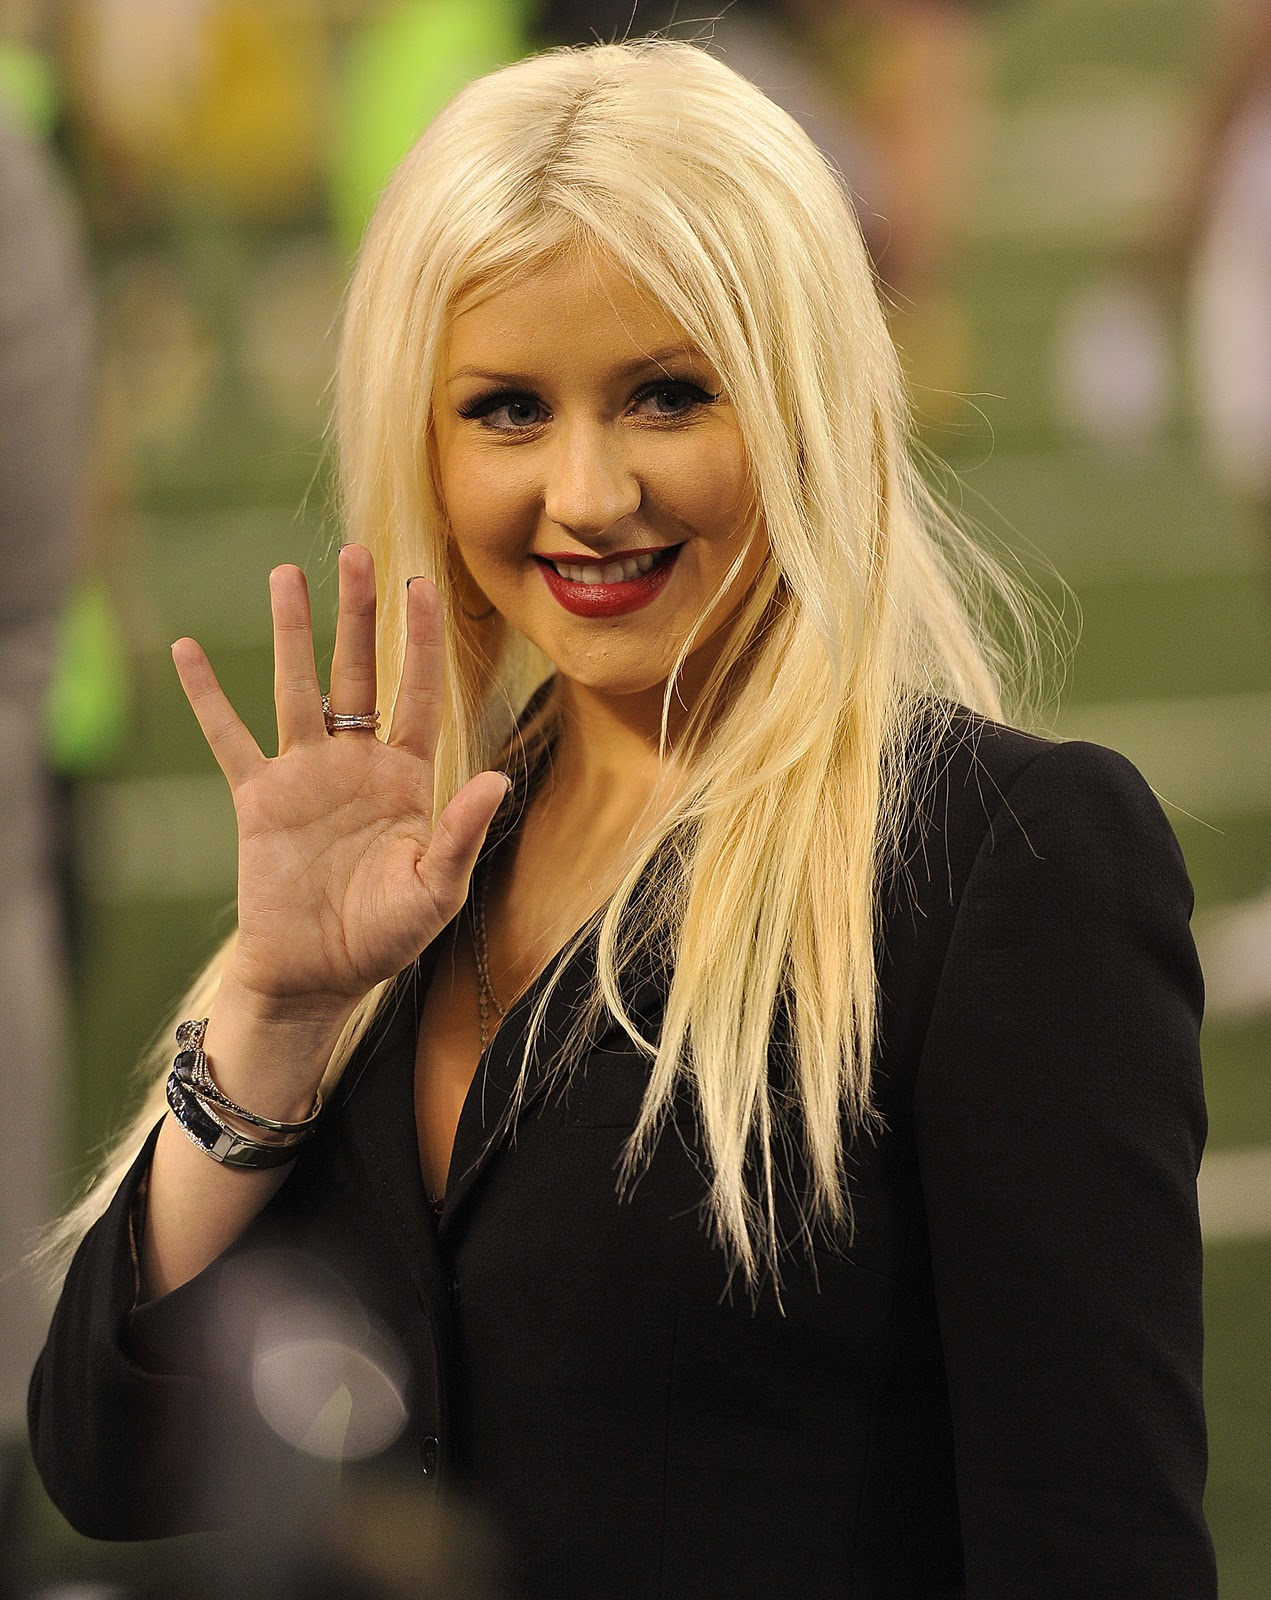 Celebrity Christina Aguilera naked (84 photo), Tits, Bikini, Selfie, cameltoe 2006